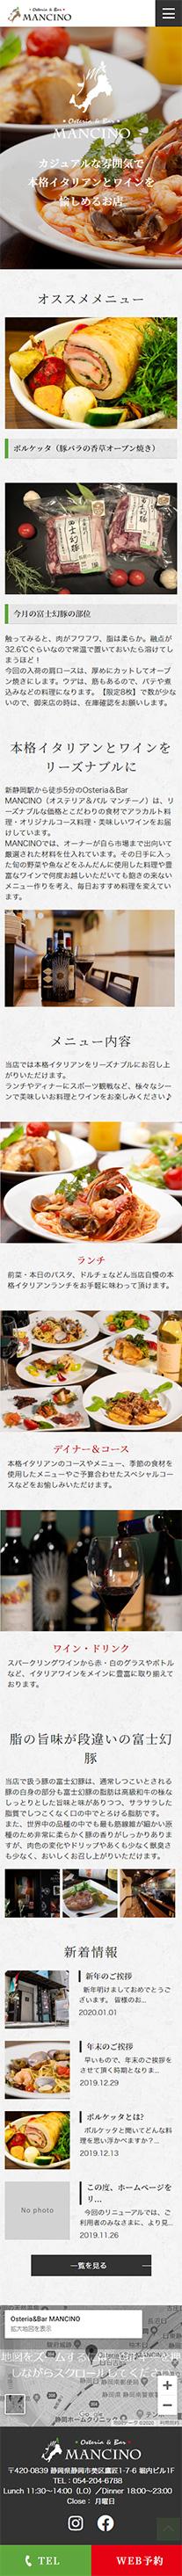 Osteria&Bar MANCINOスマホTOP画像